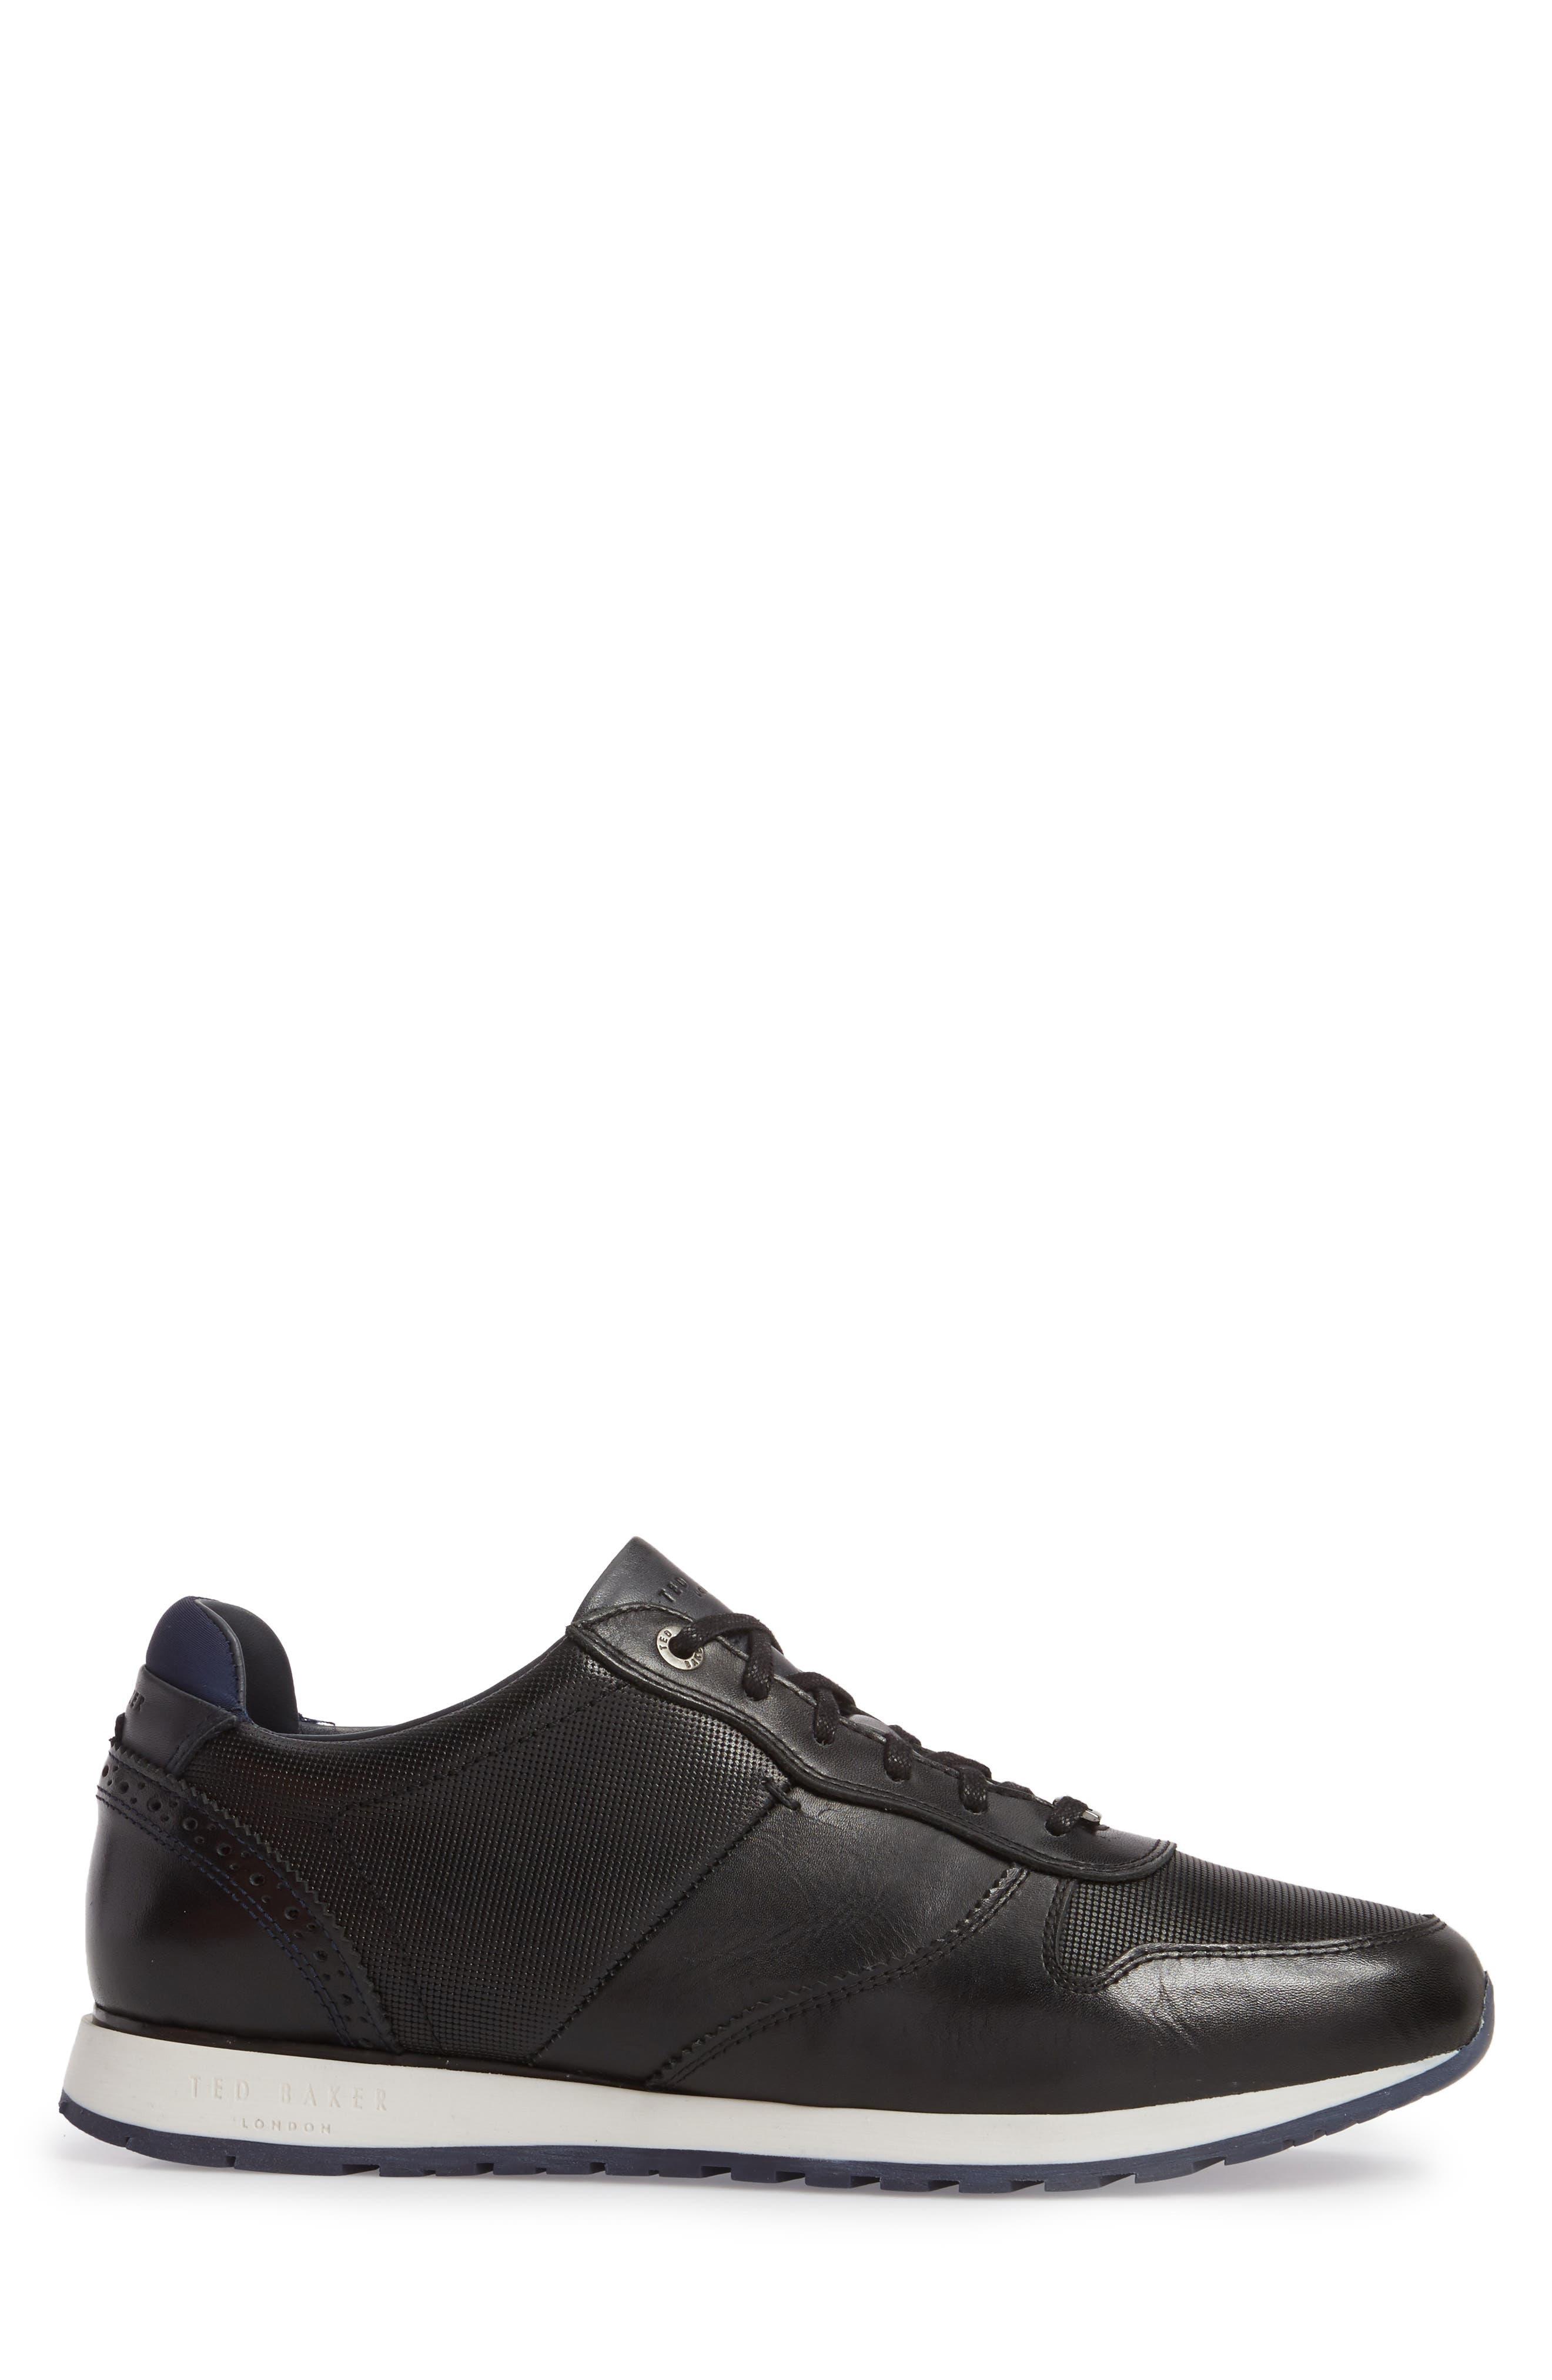 Shindl Sneaker,                             Alternate thumbnail 3, color,                             Black Leather